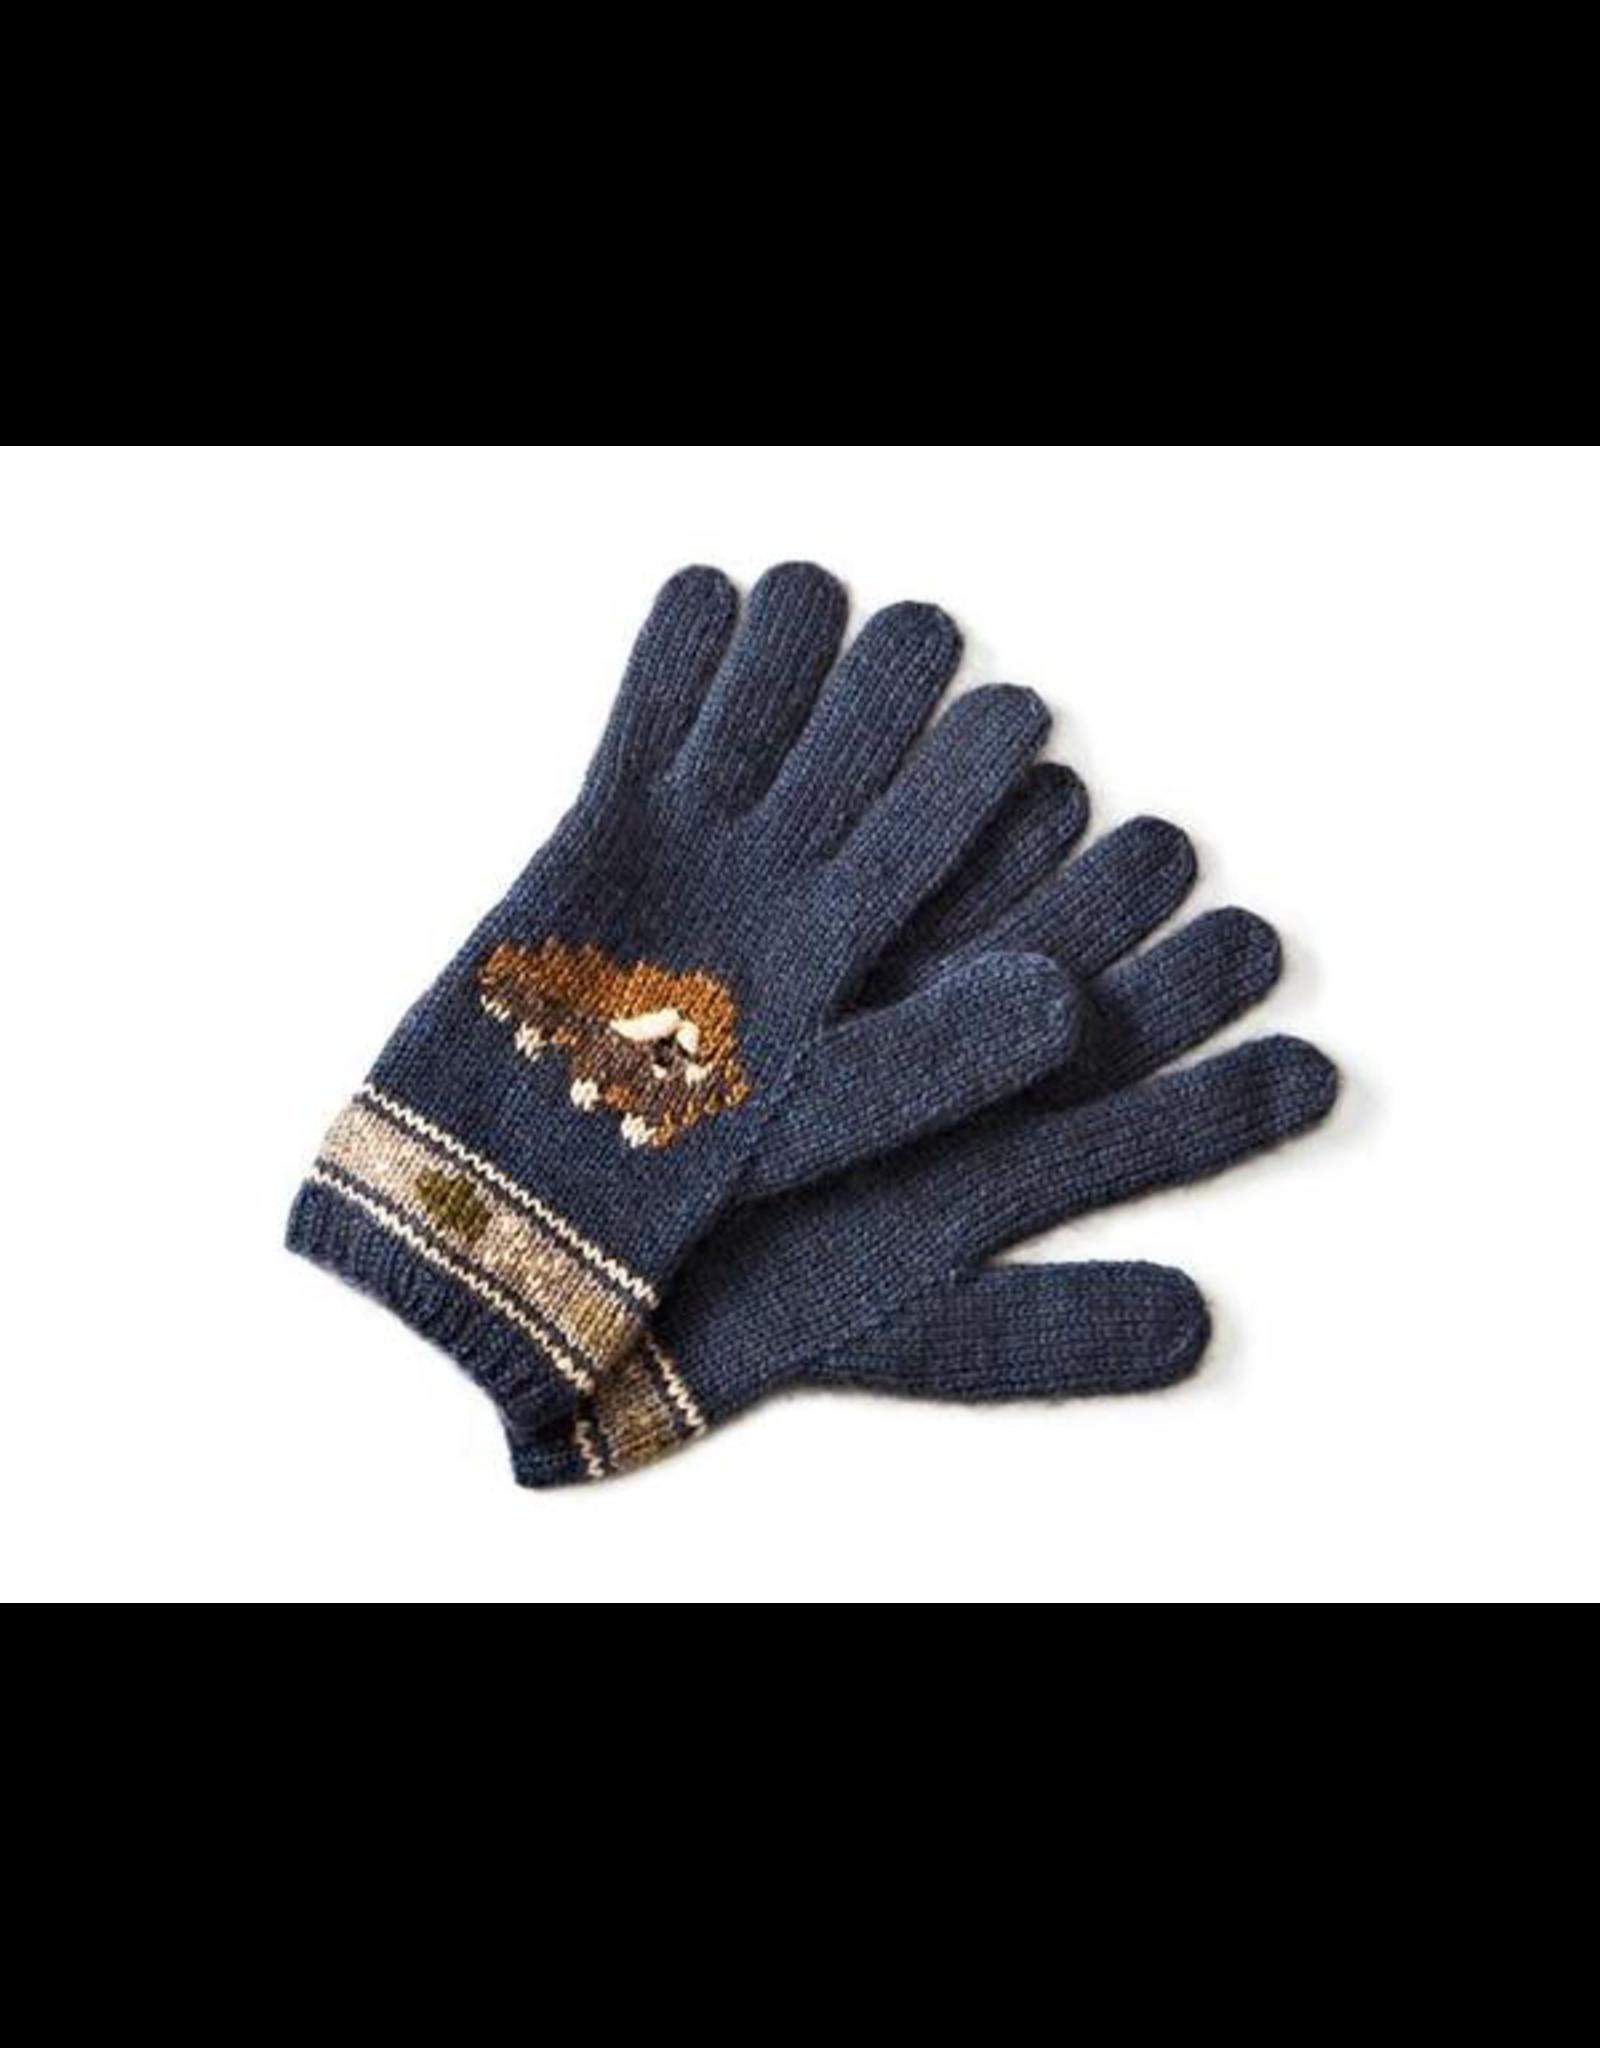 Muskox Gloves - 45% Qiviuk 45% Merino 10% Silk